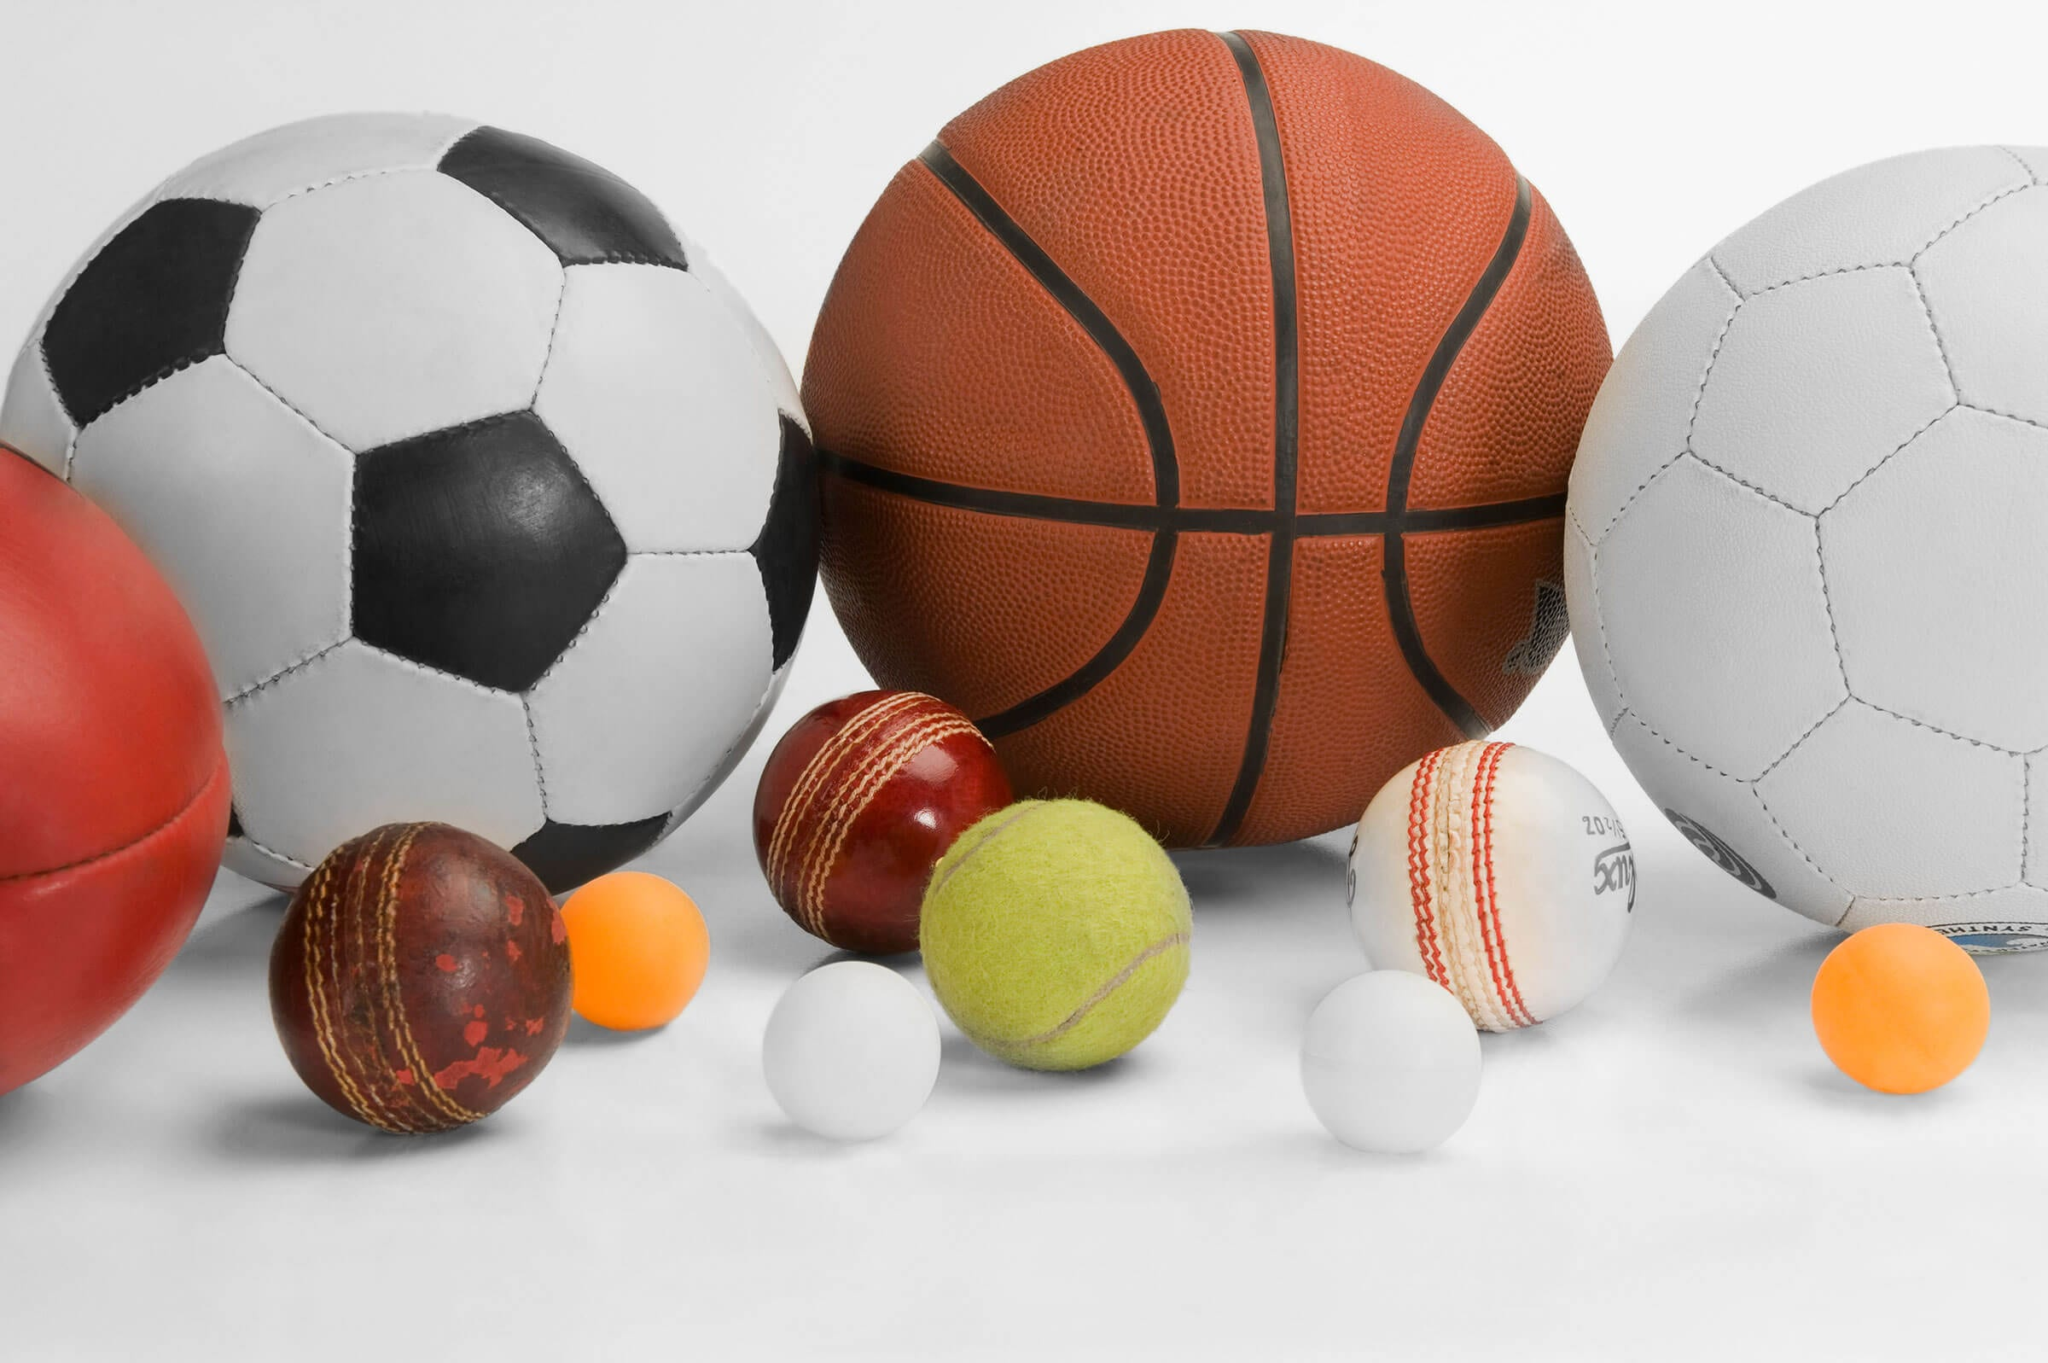 sport skills development translates life lessons